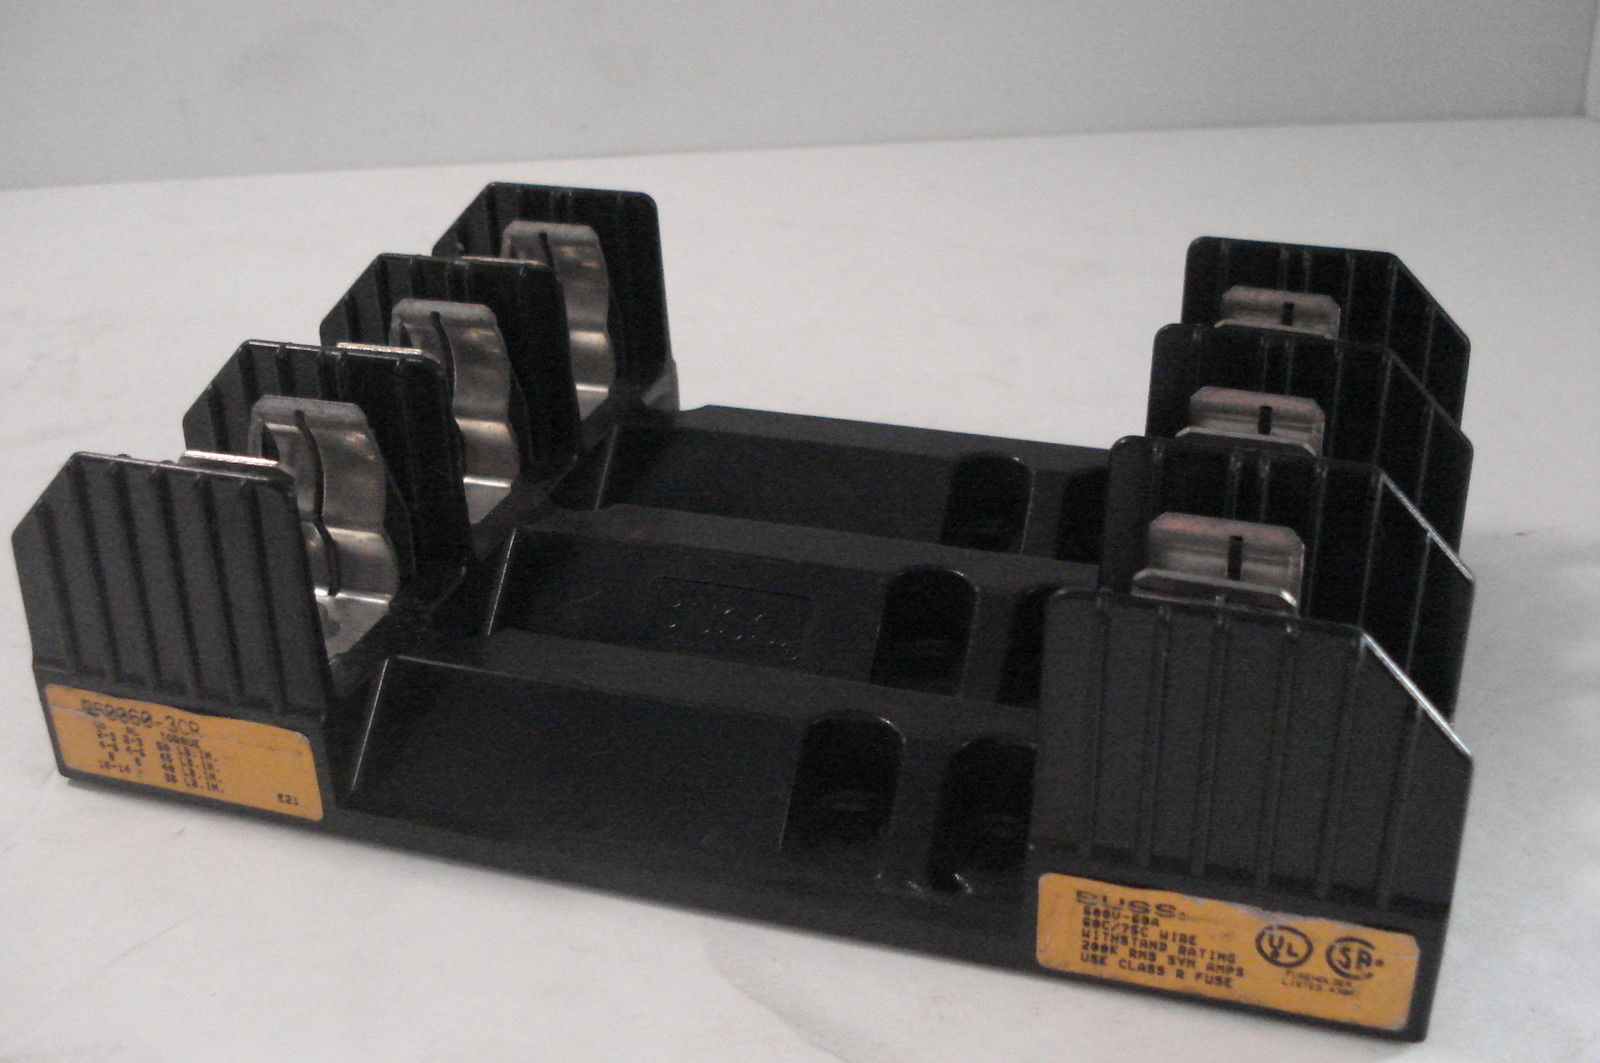 Edison Fuse Box Auto Electrical Wiring Diagram 03 Kia Spectra Sb Industrial Supply Plc Equipment Parts